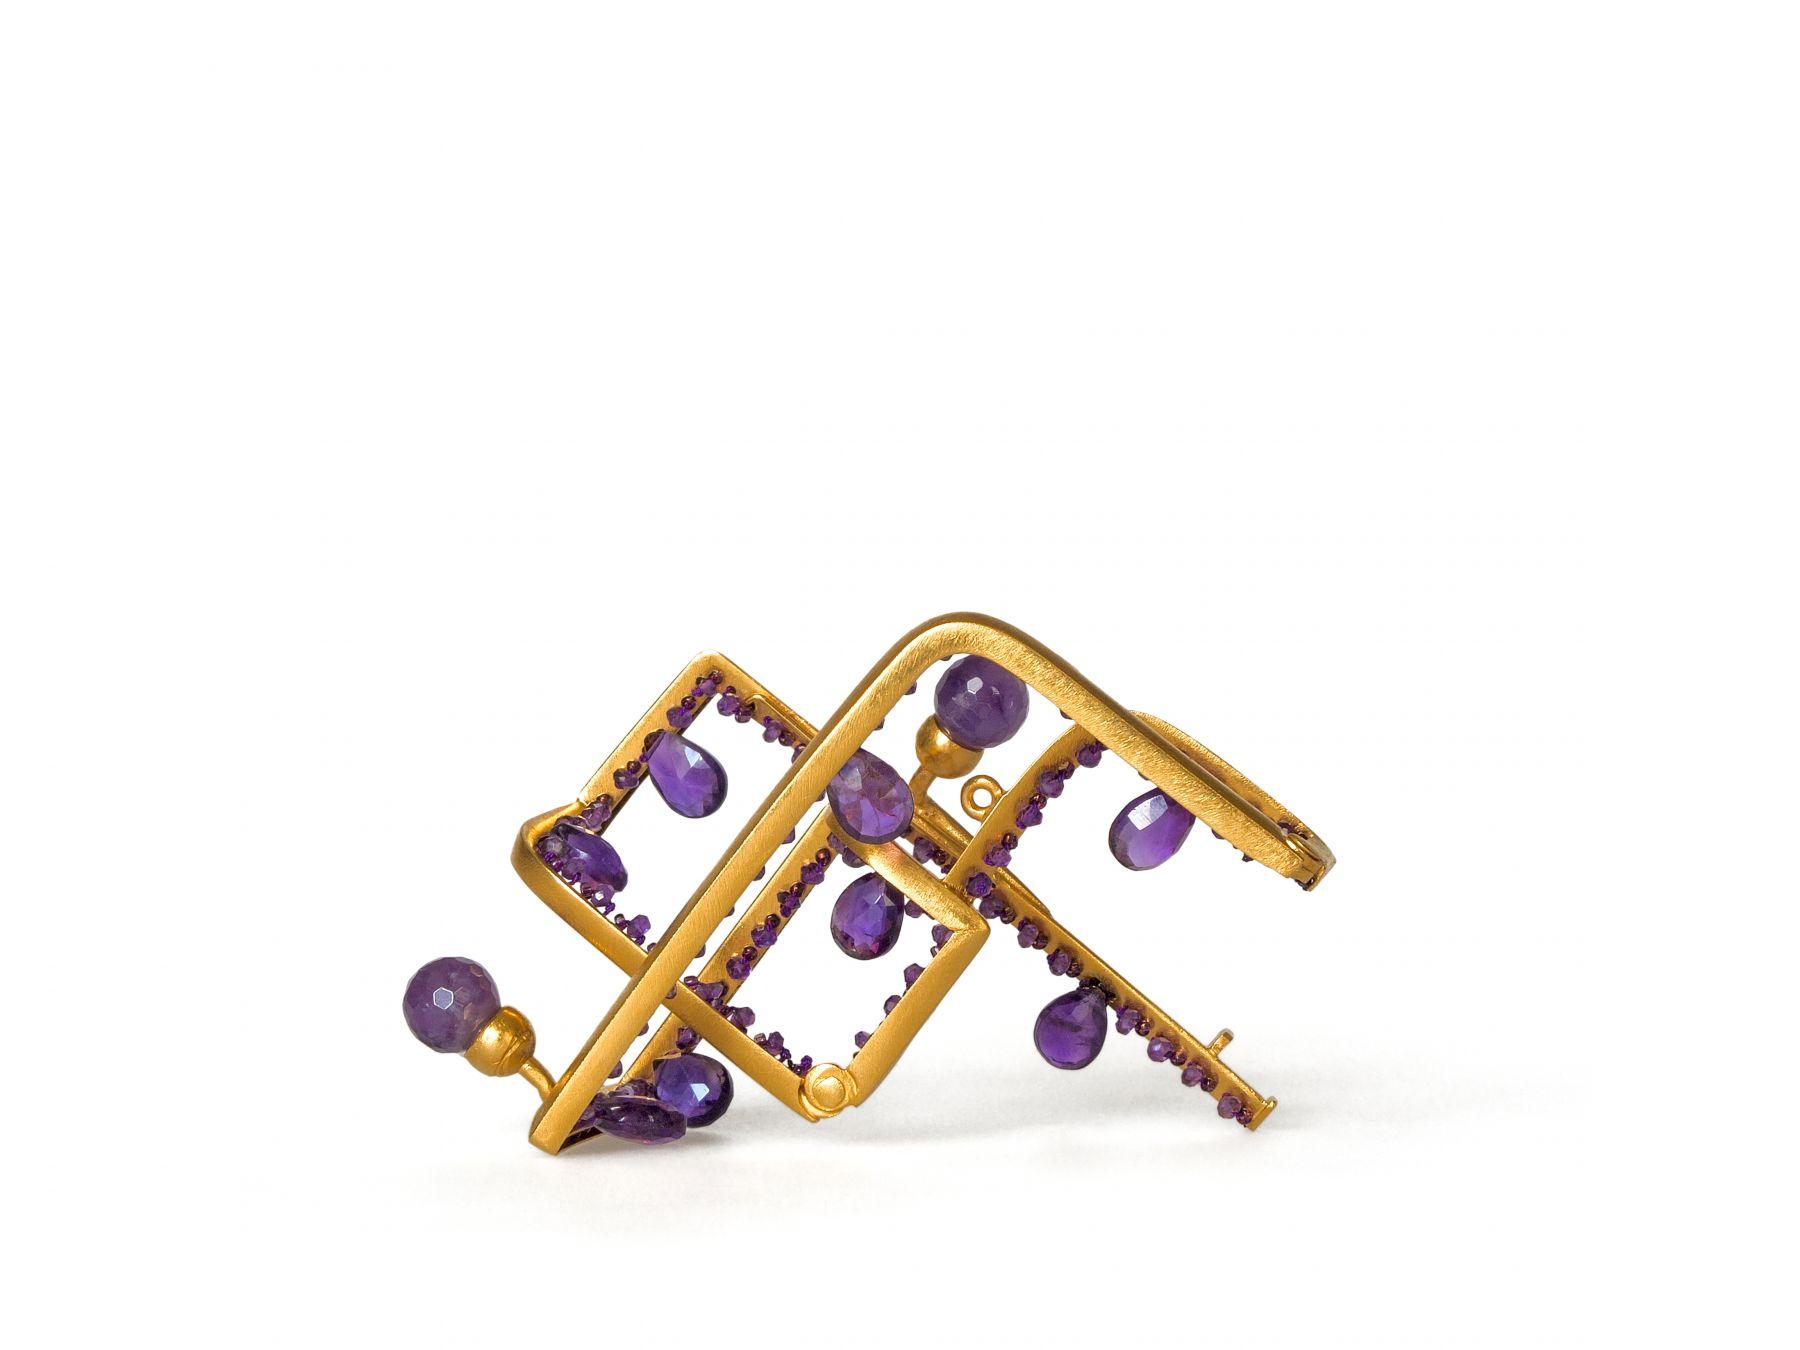 Petra Zimmermann, brooch, contemporary jewelry, austria